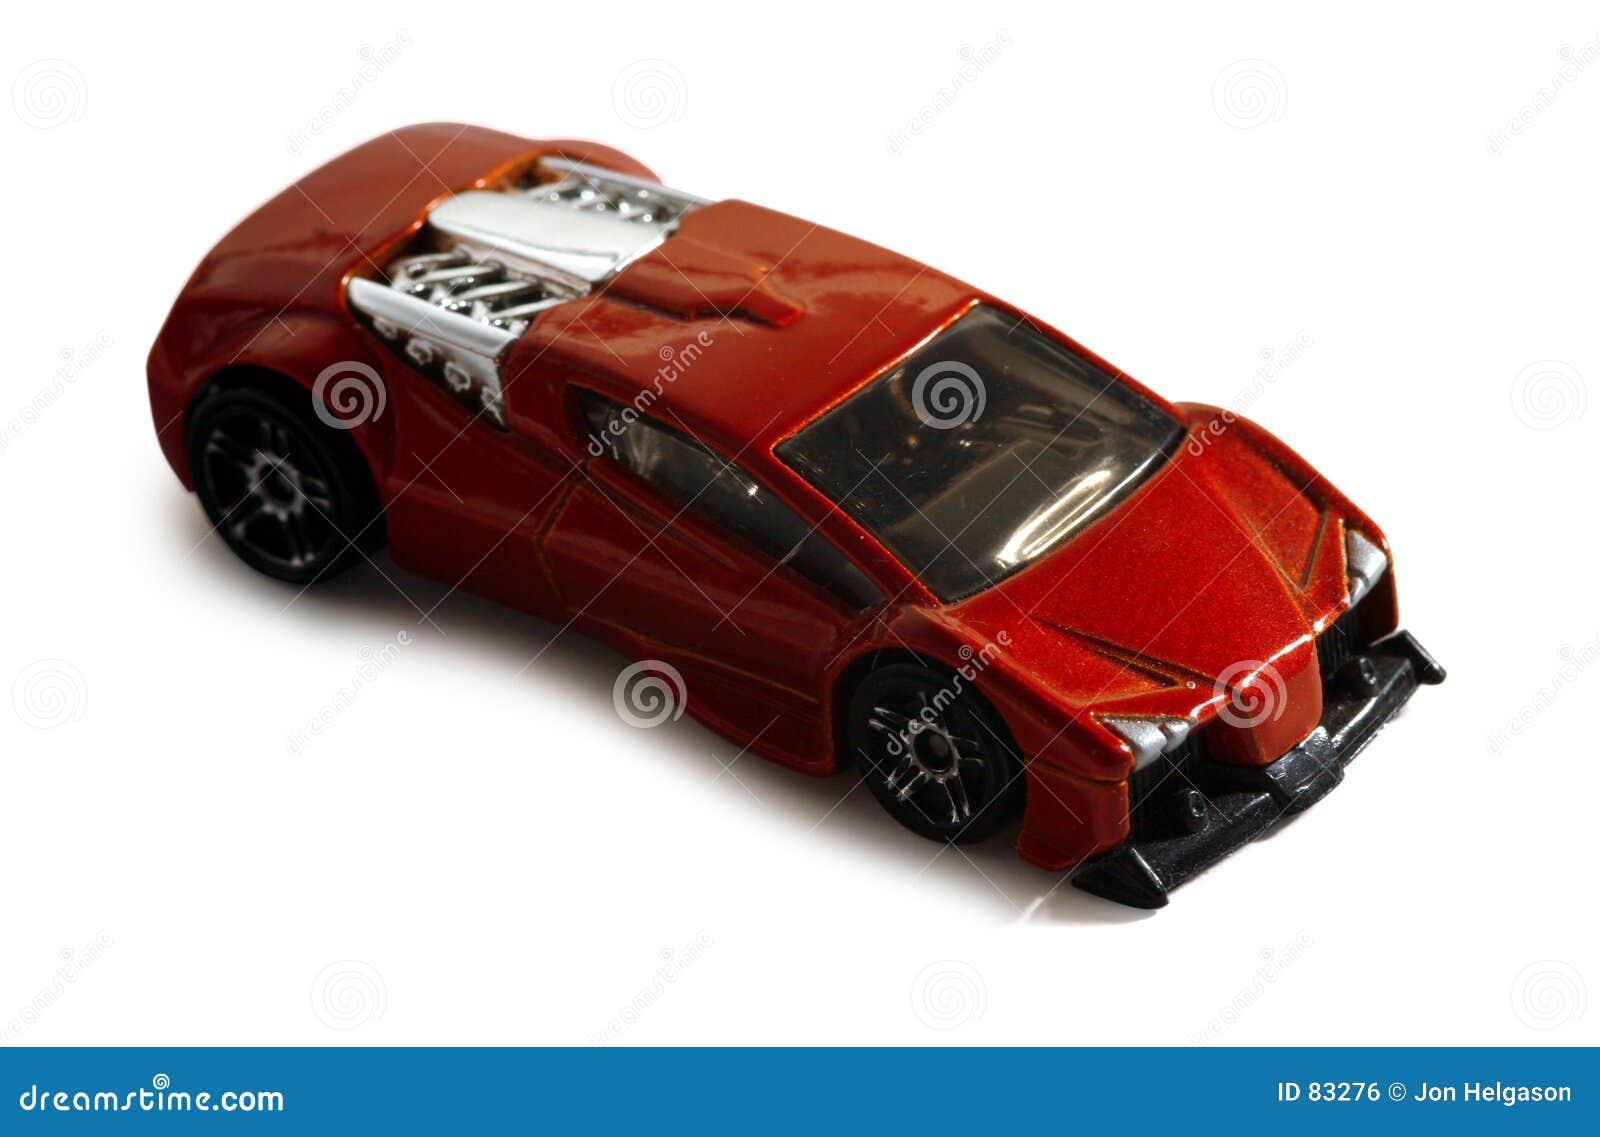 Samochód miniatury zabawka